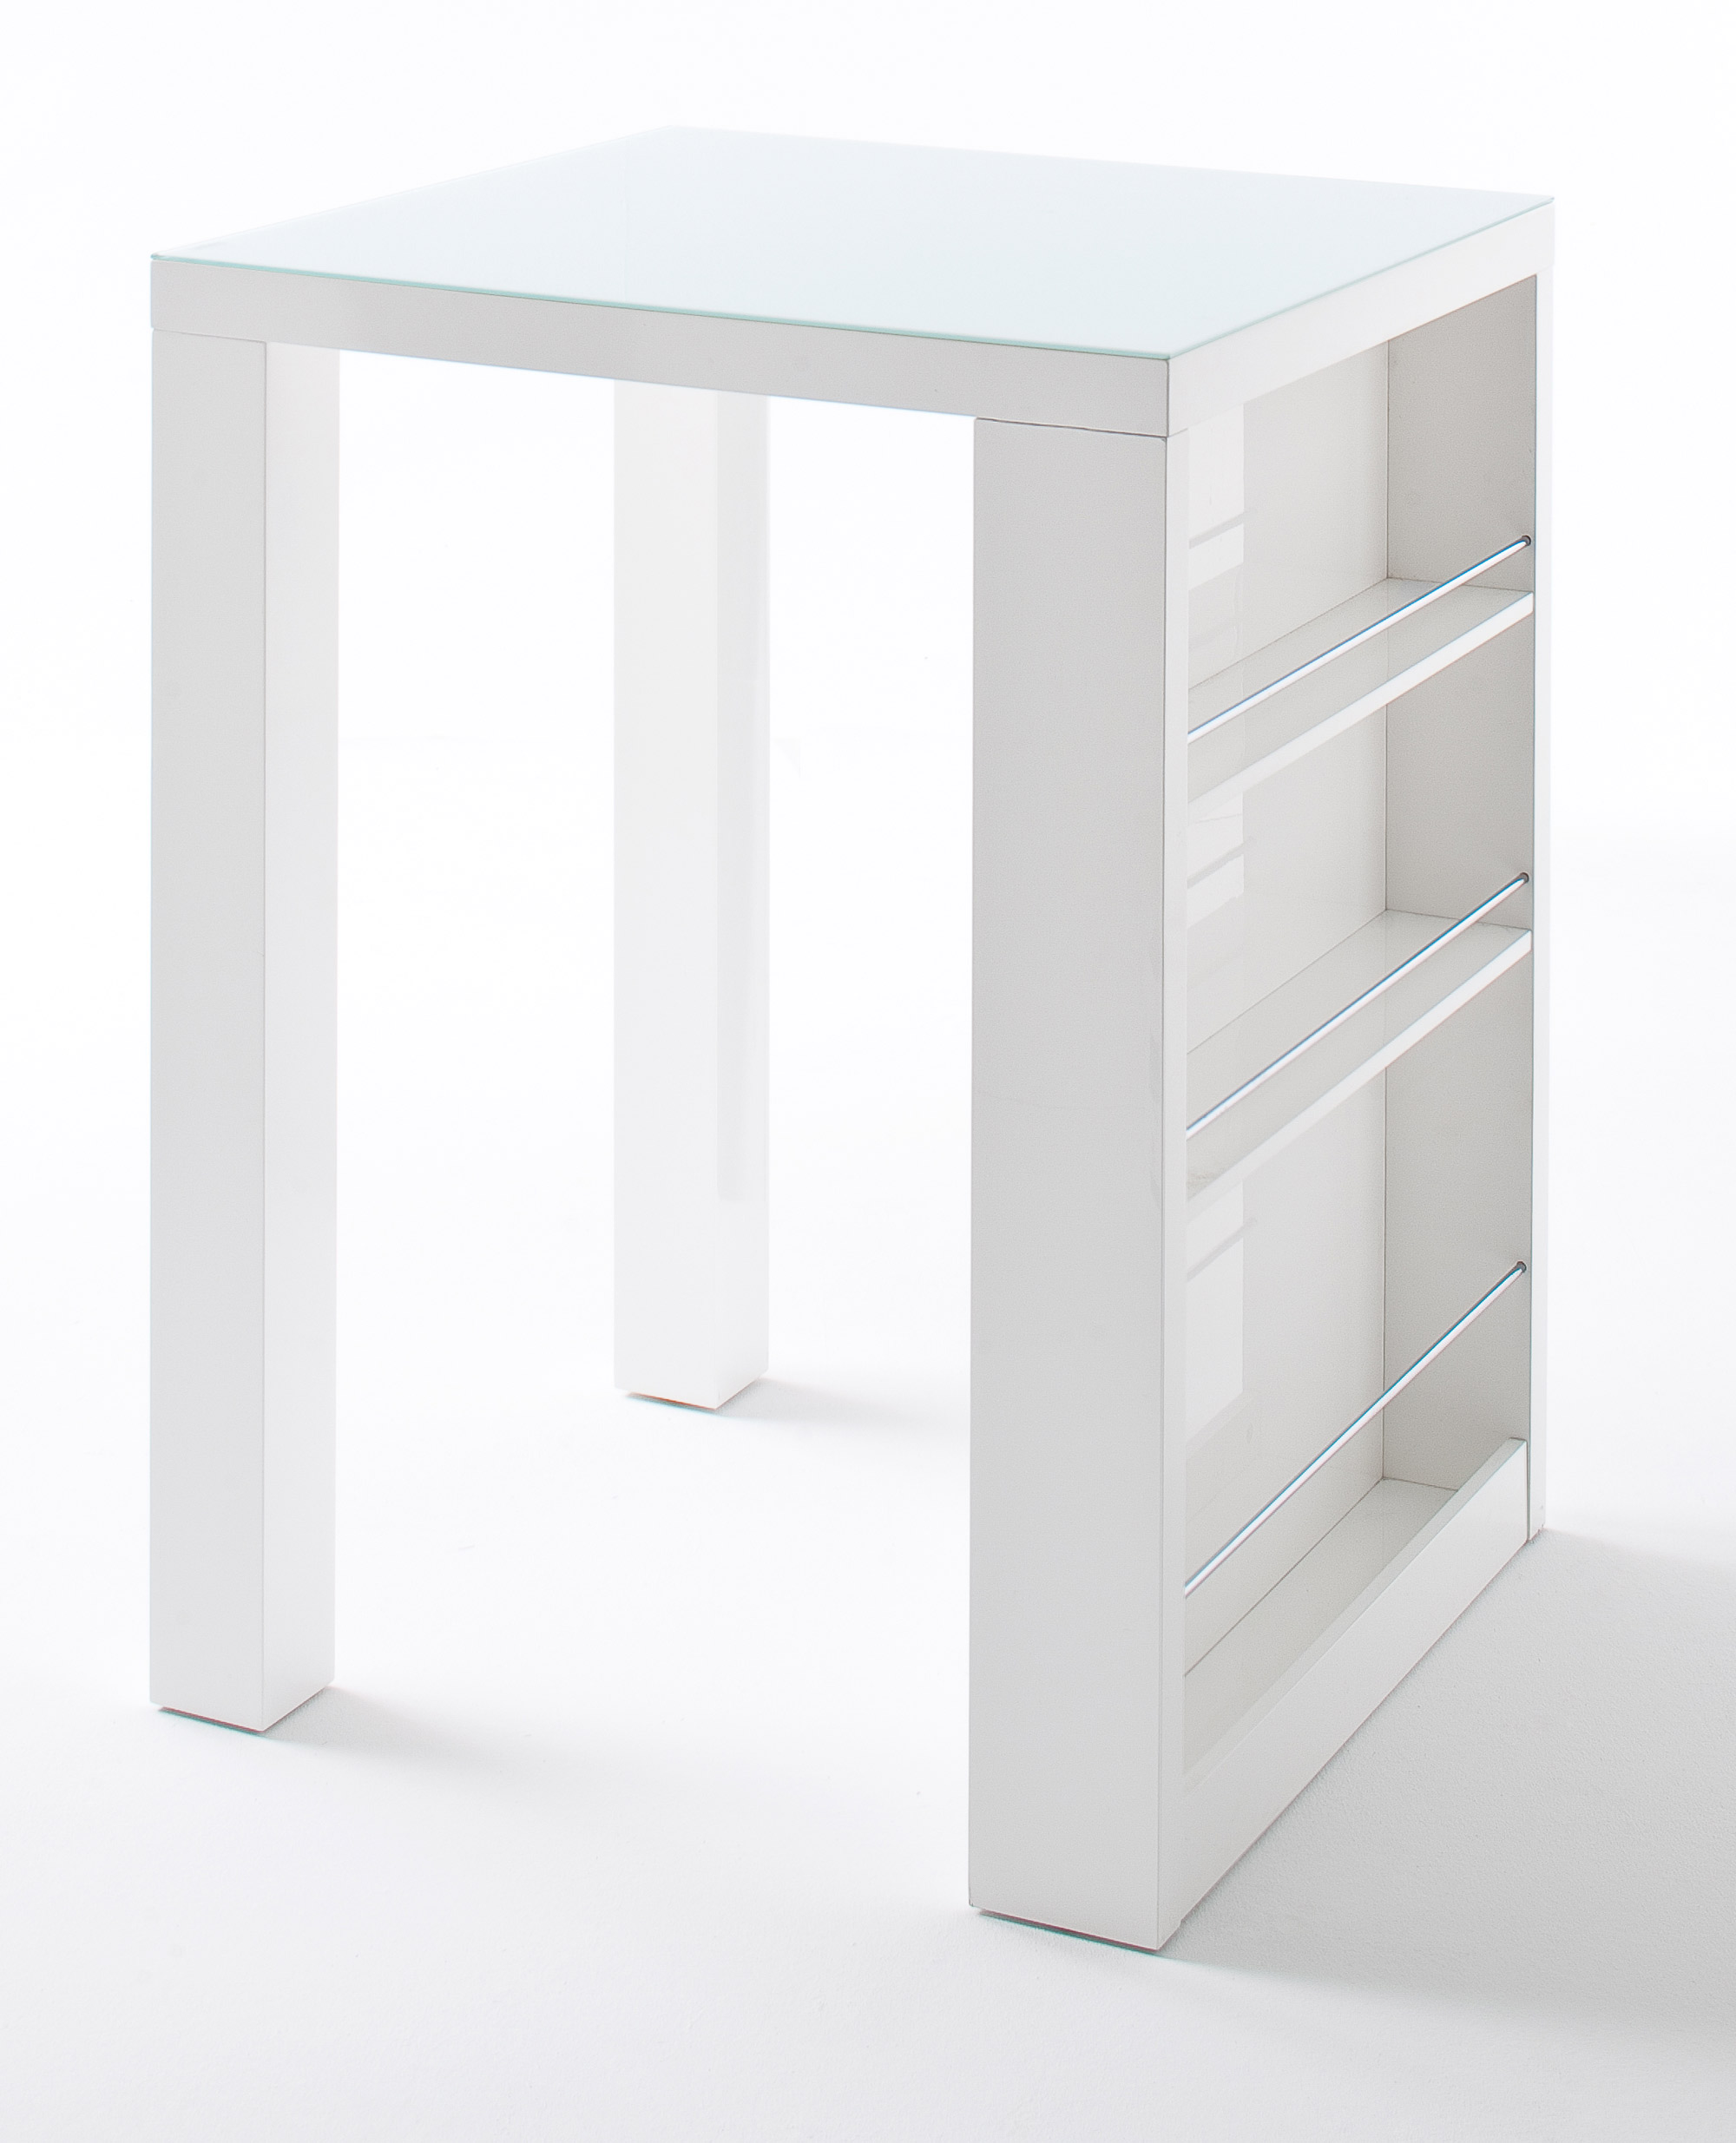 Bartafel Keuken Ikea : Image 24designs Bartafel Royal Glass – B80 X H107 Cm – Wit